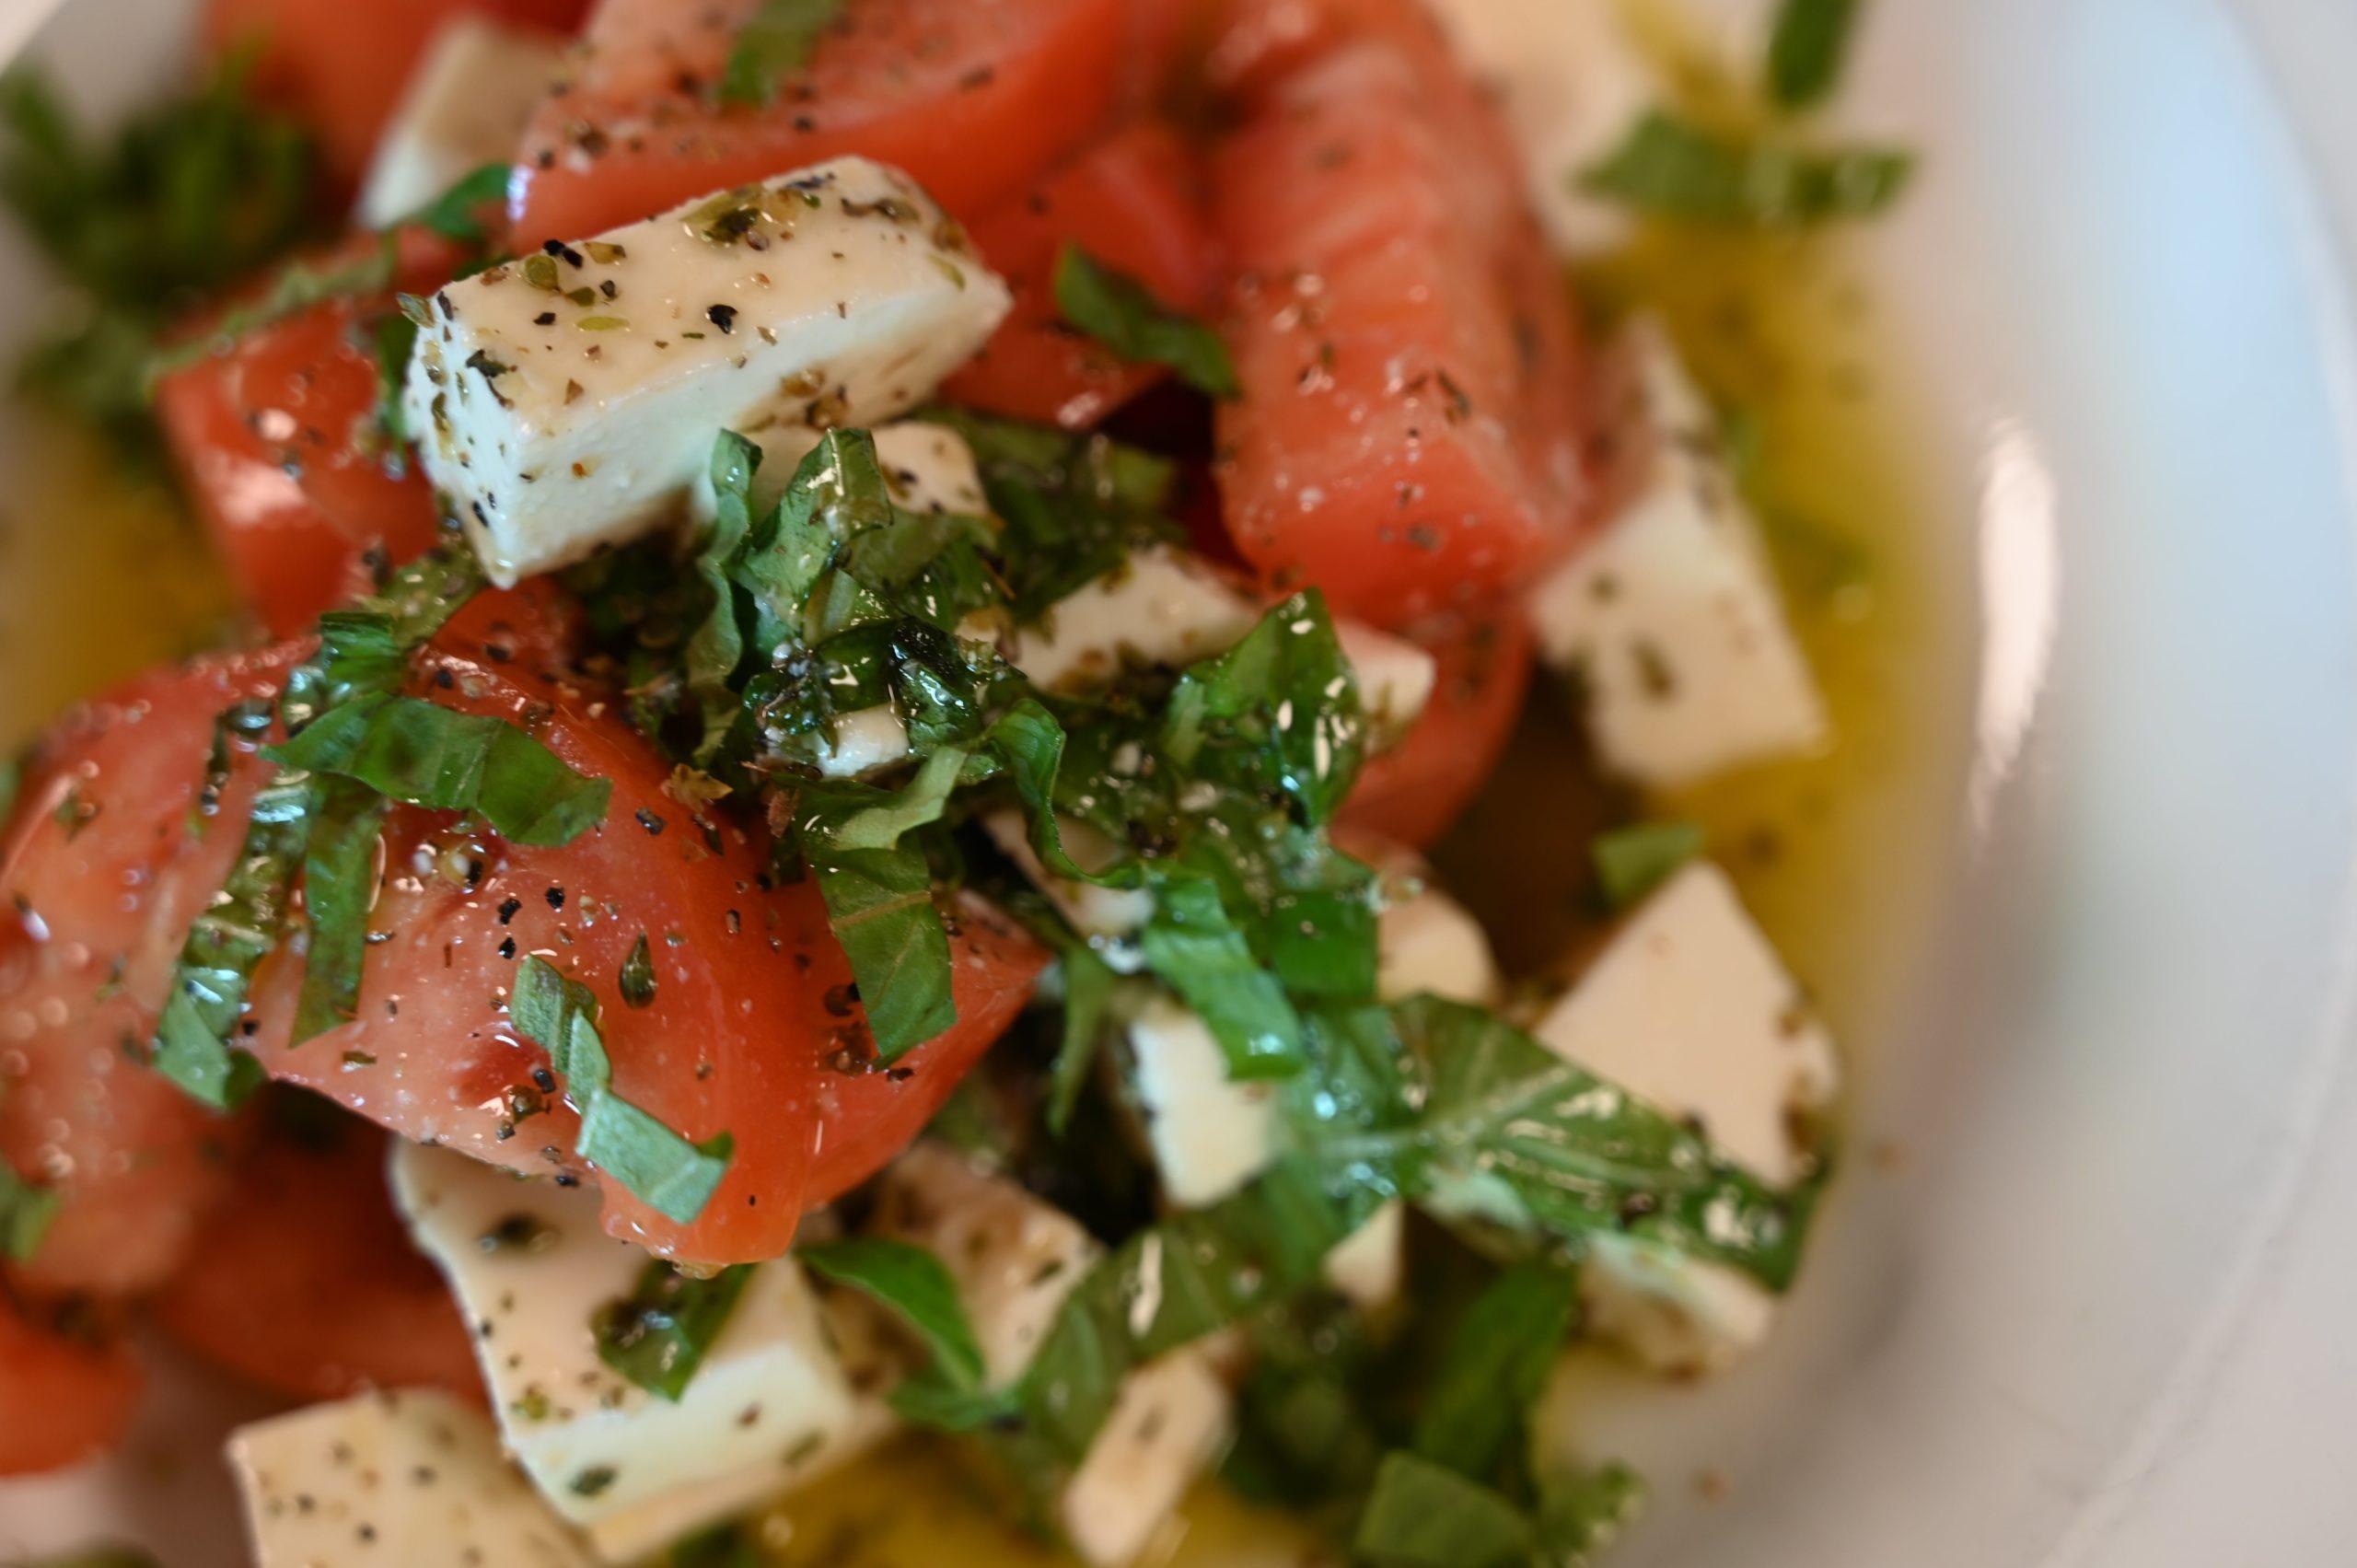 tomato salad, mozzarella cheese, oil dressing